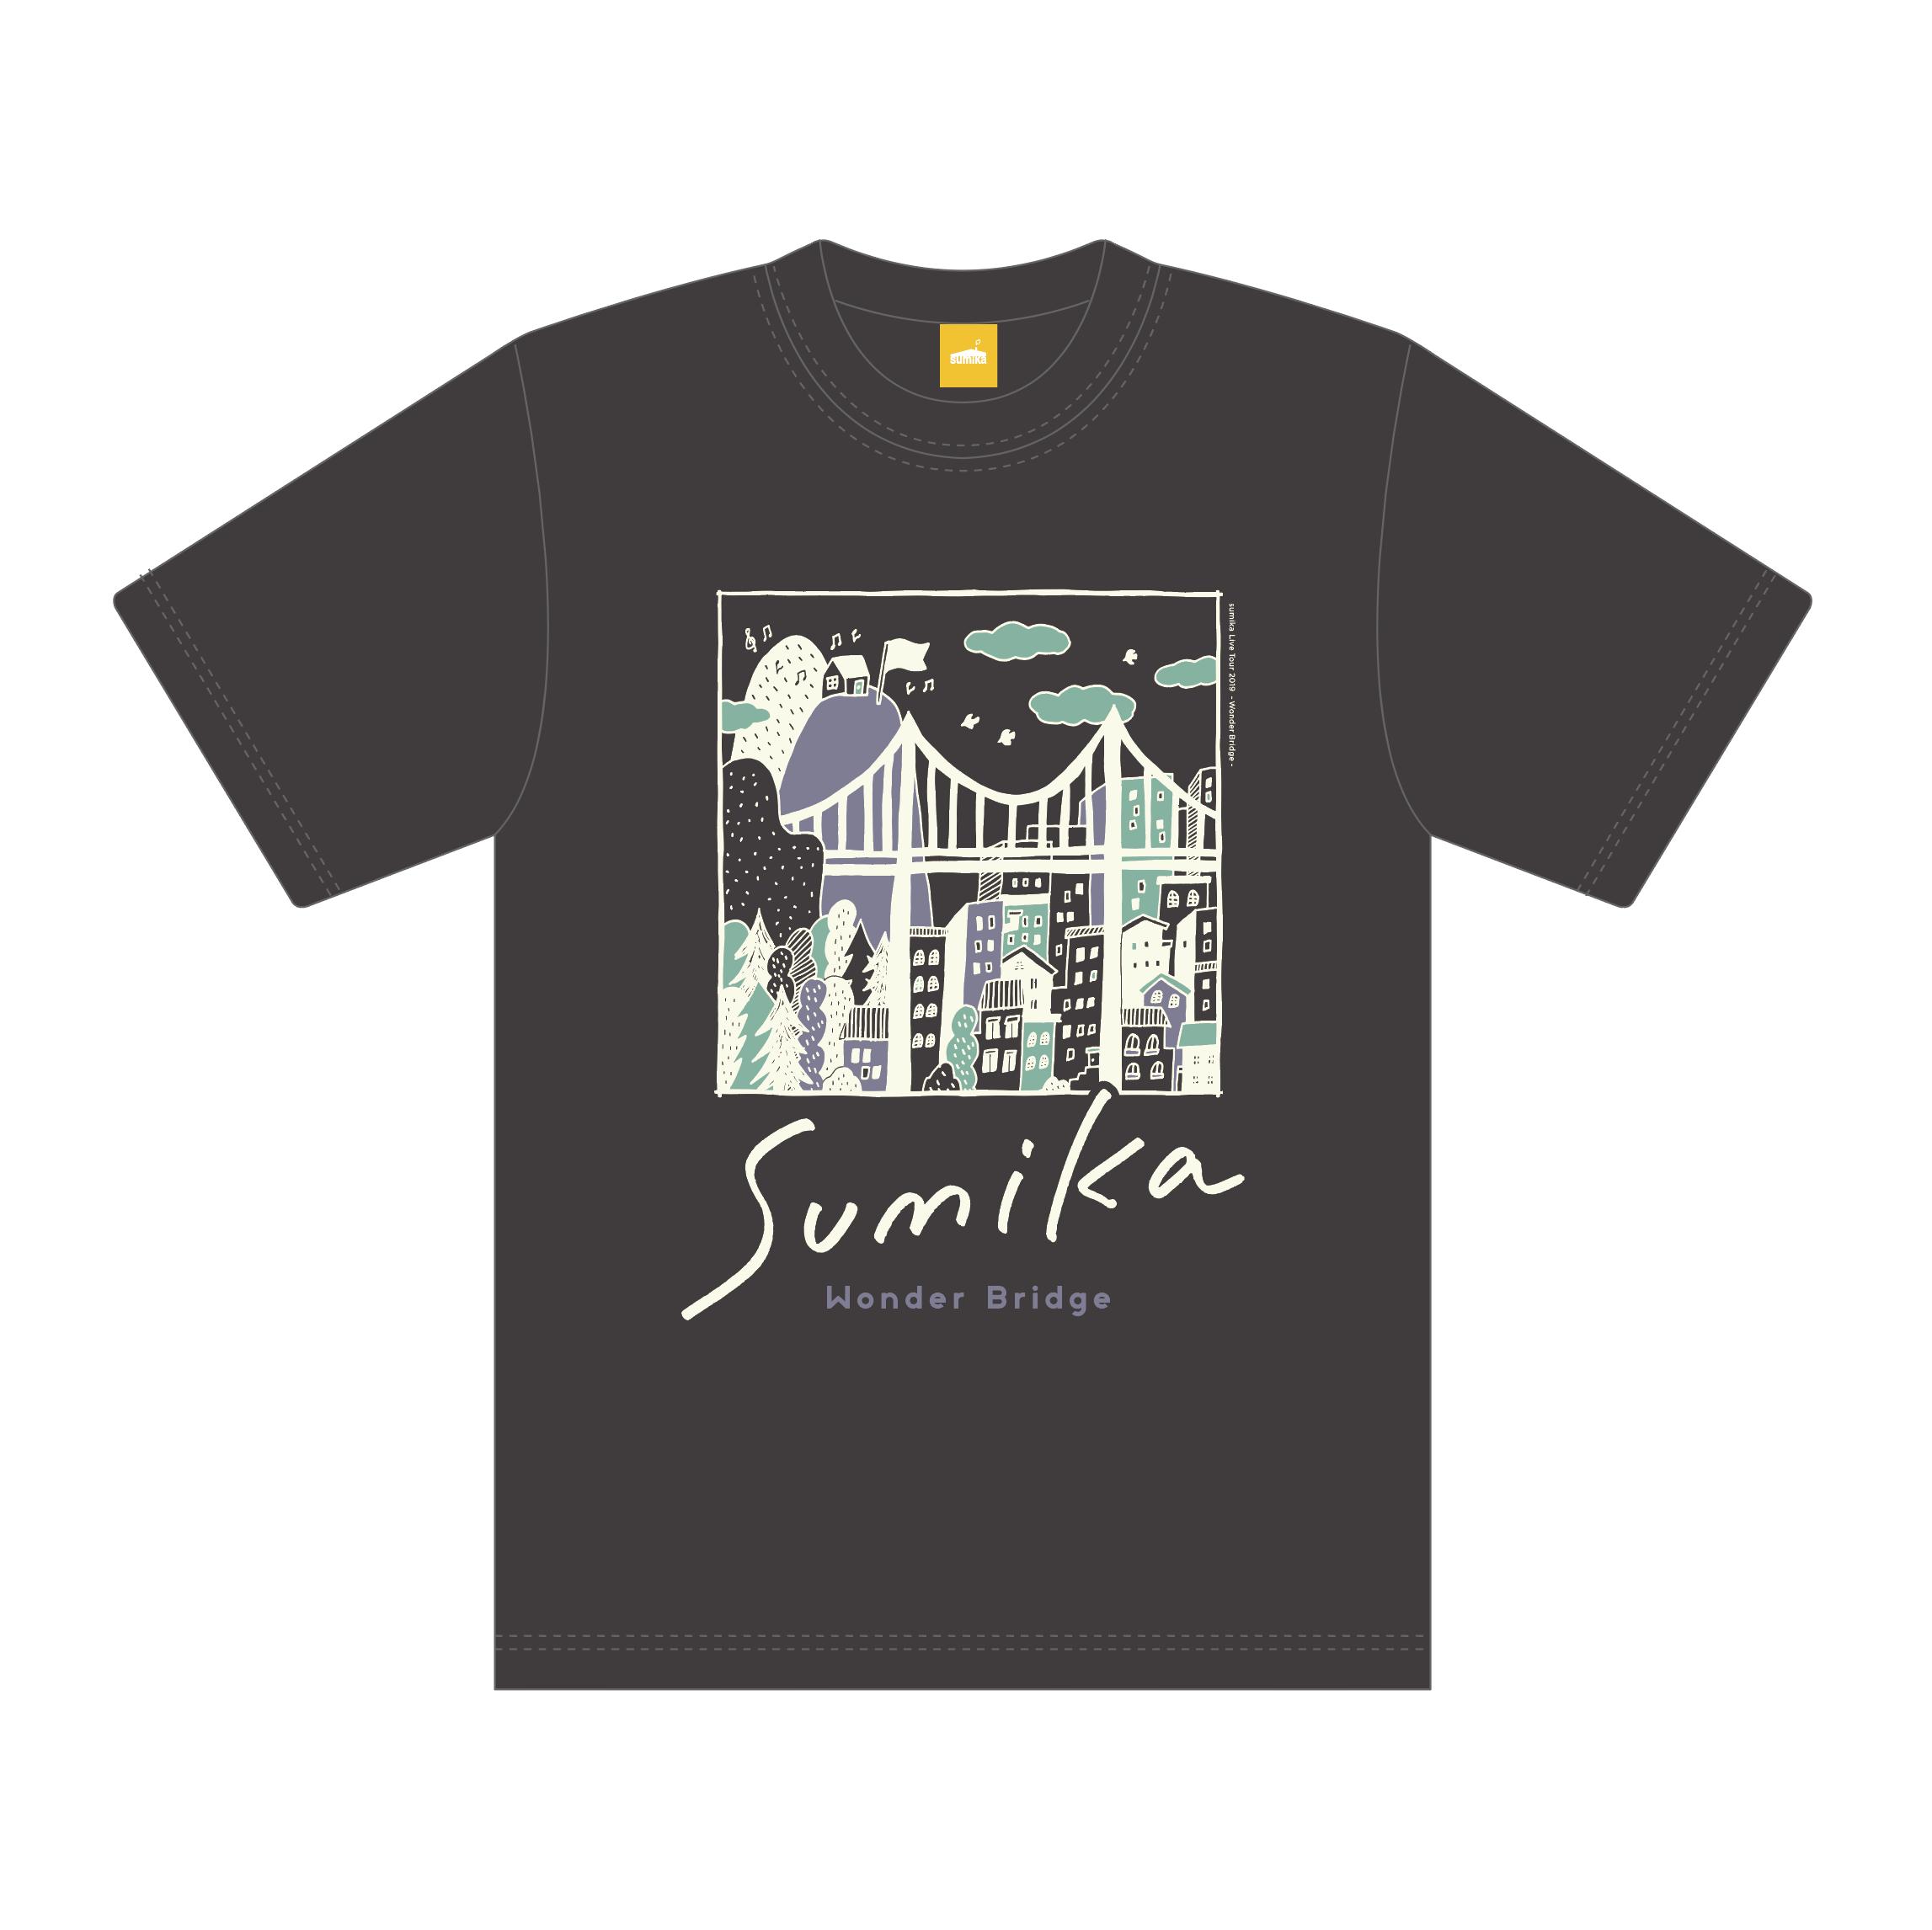 sumika / Wonder Bridge Tシャツ(スミ)